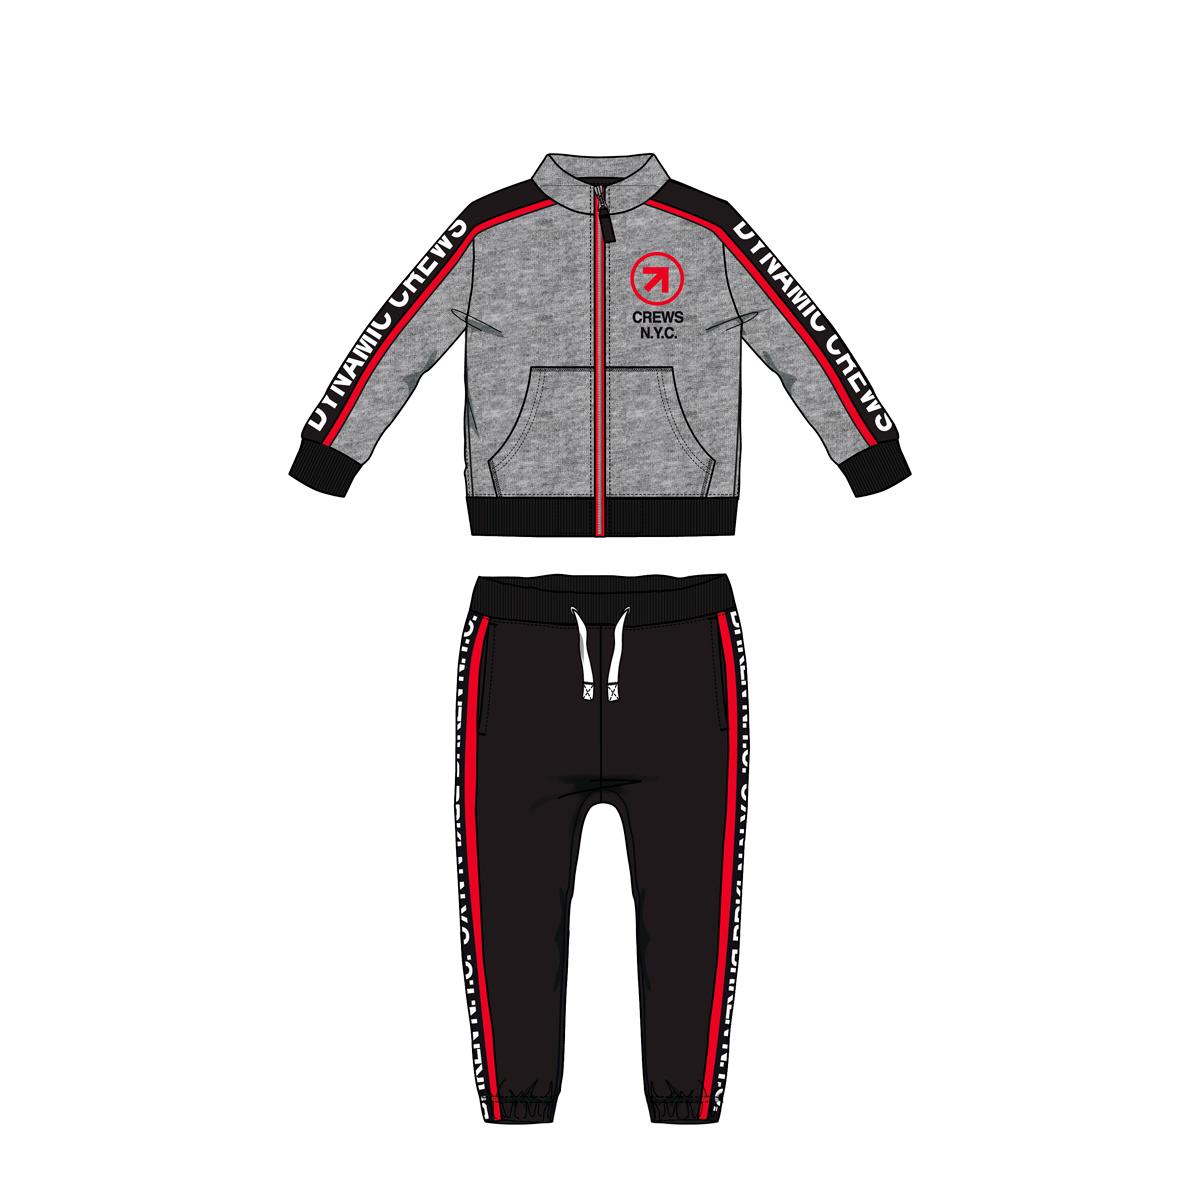 Trening copii Chicco, jacheta si pantalon, gri, 78751